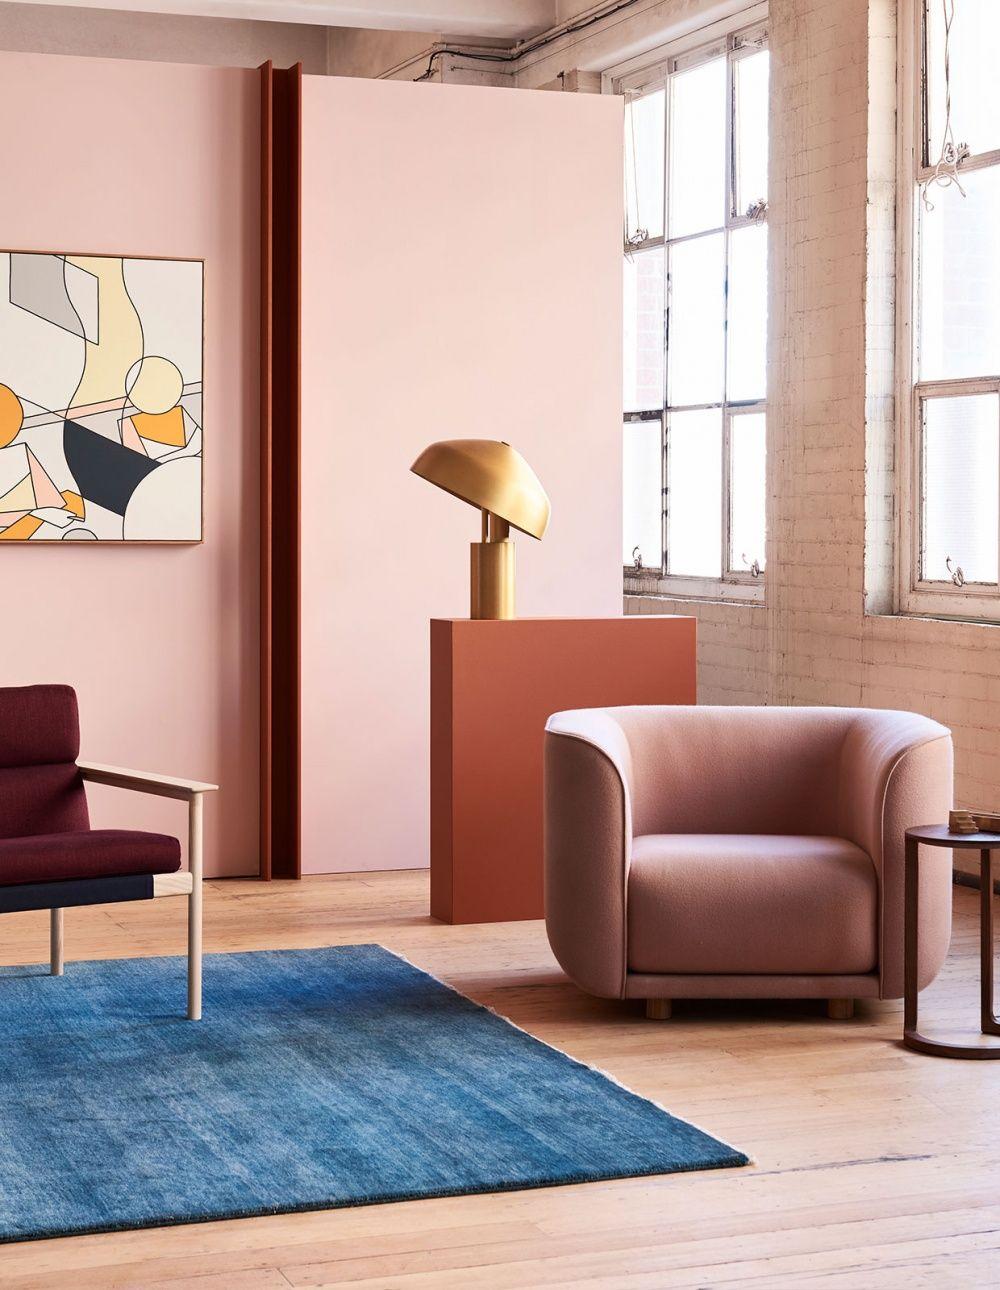 Home Design Ideas 2017: The Design Files Open House 2017